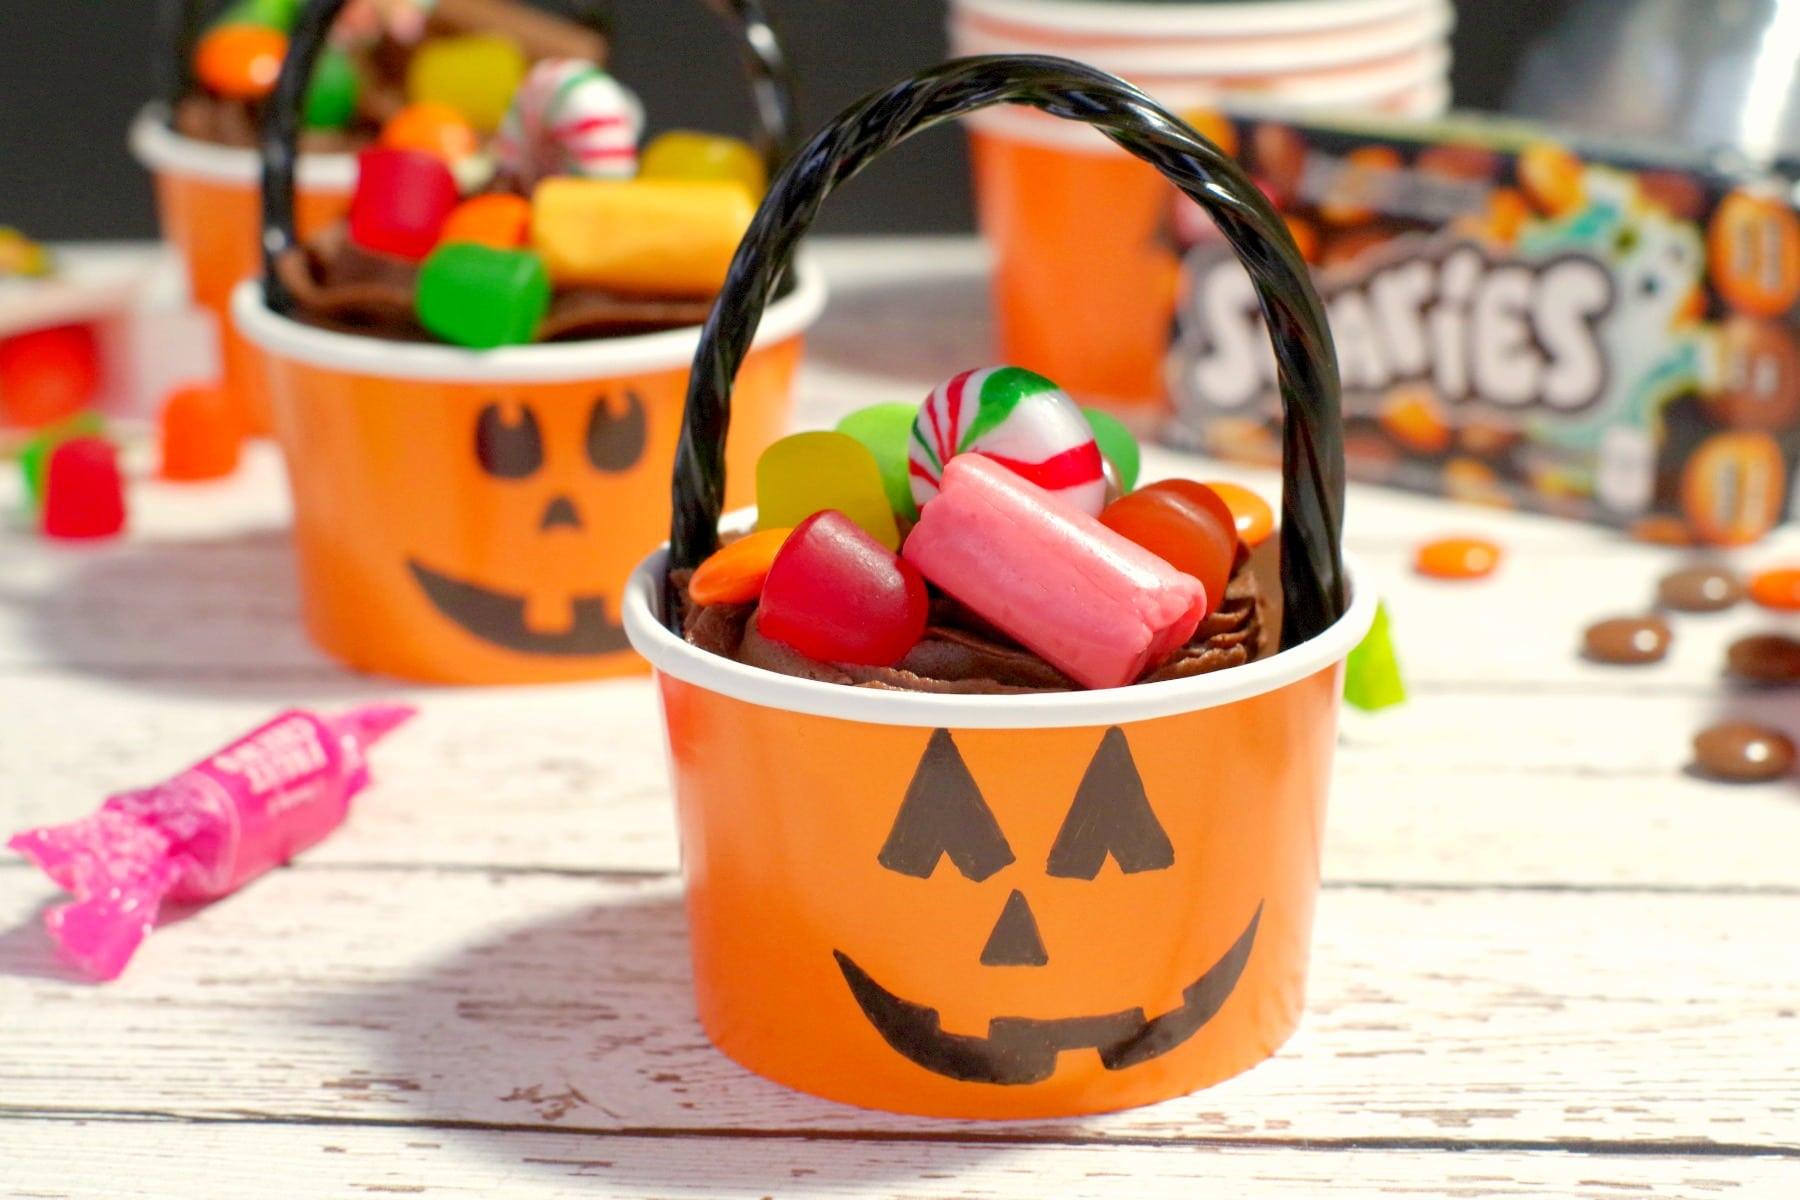 Halloween Jack o'latern bucket cupcake with candy strewn around